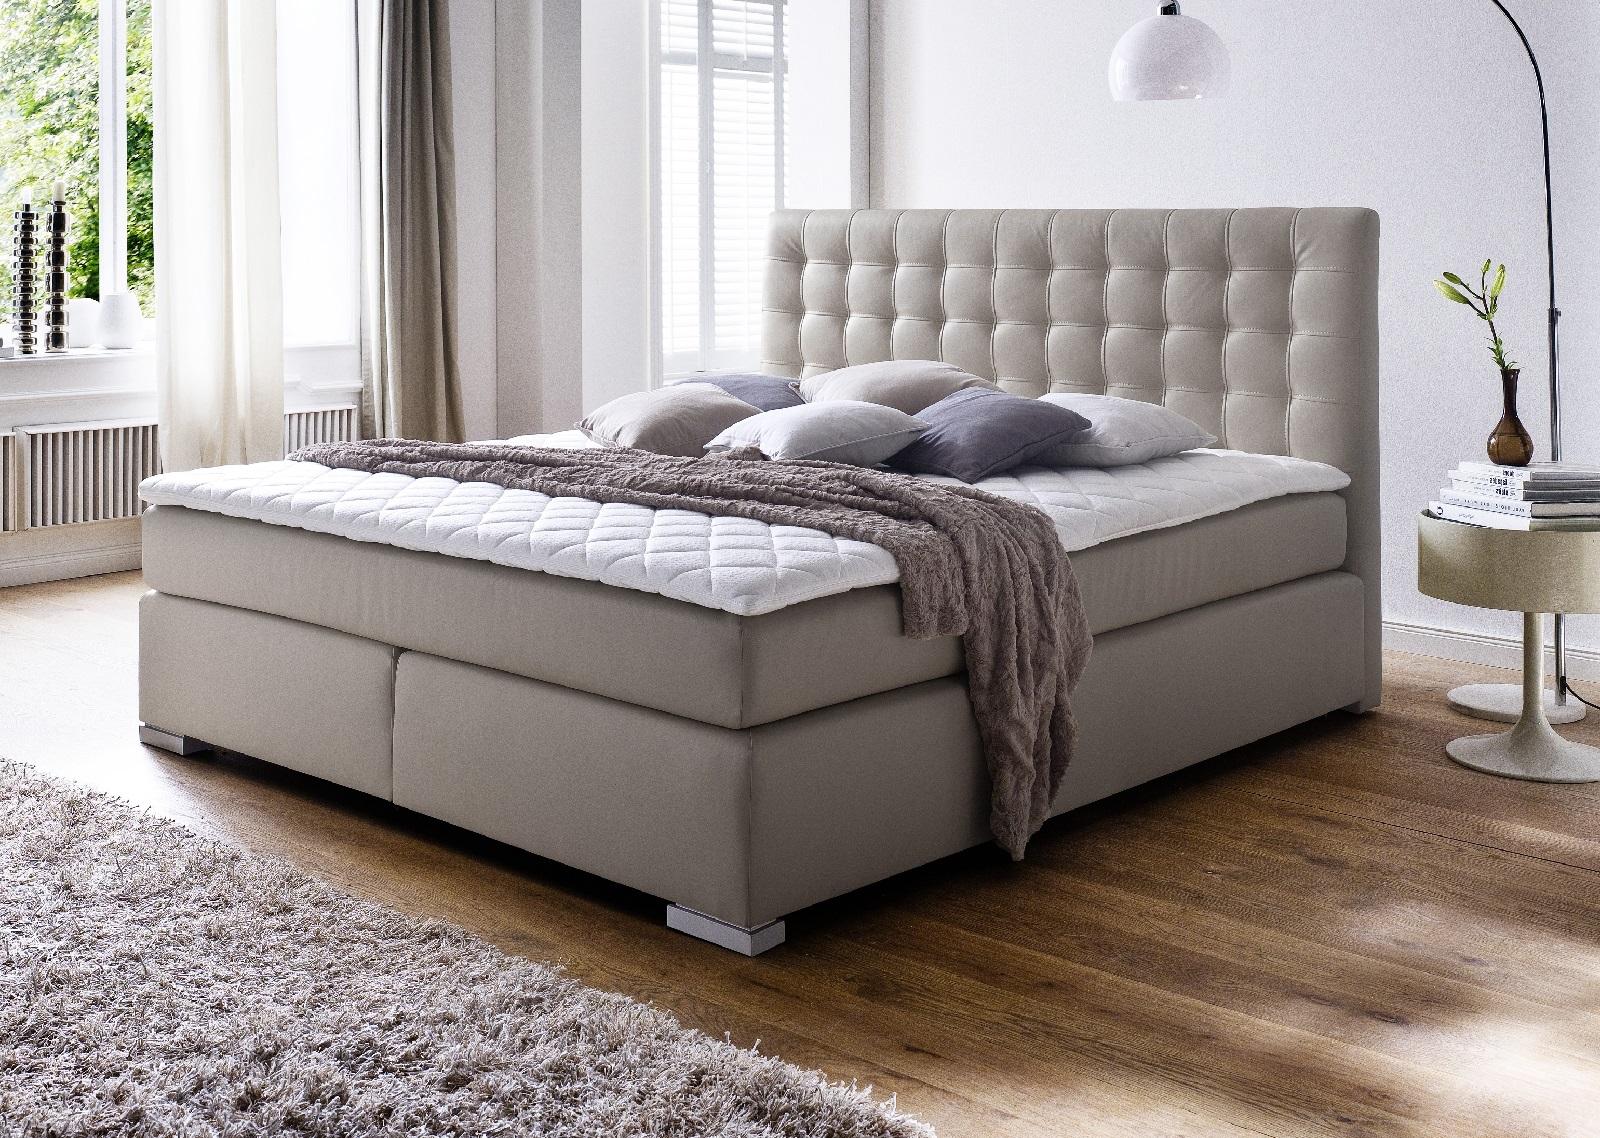 boxspringbett isabelle muddy 180cm x 200cm. Black Bedroom Furniture Sets. Home Design Ideas